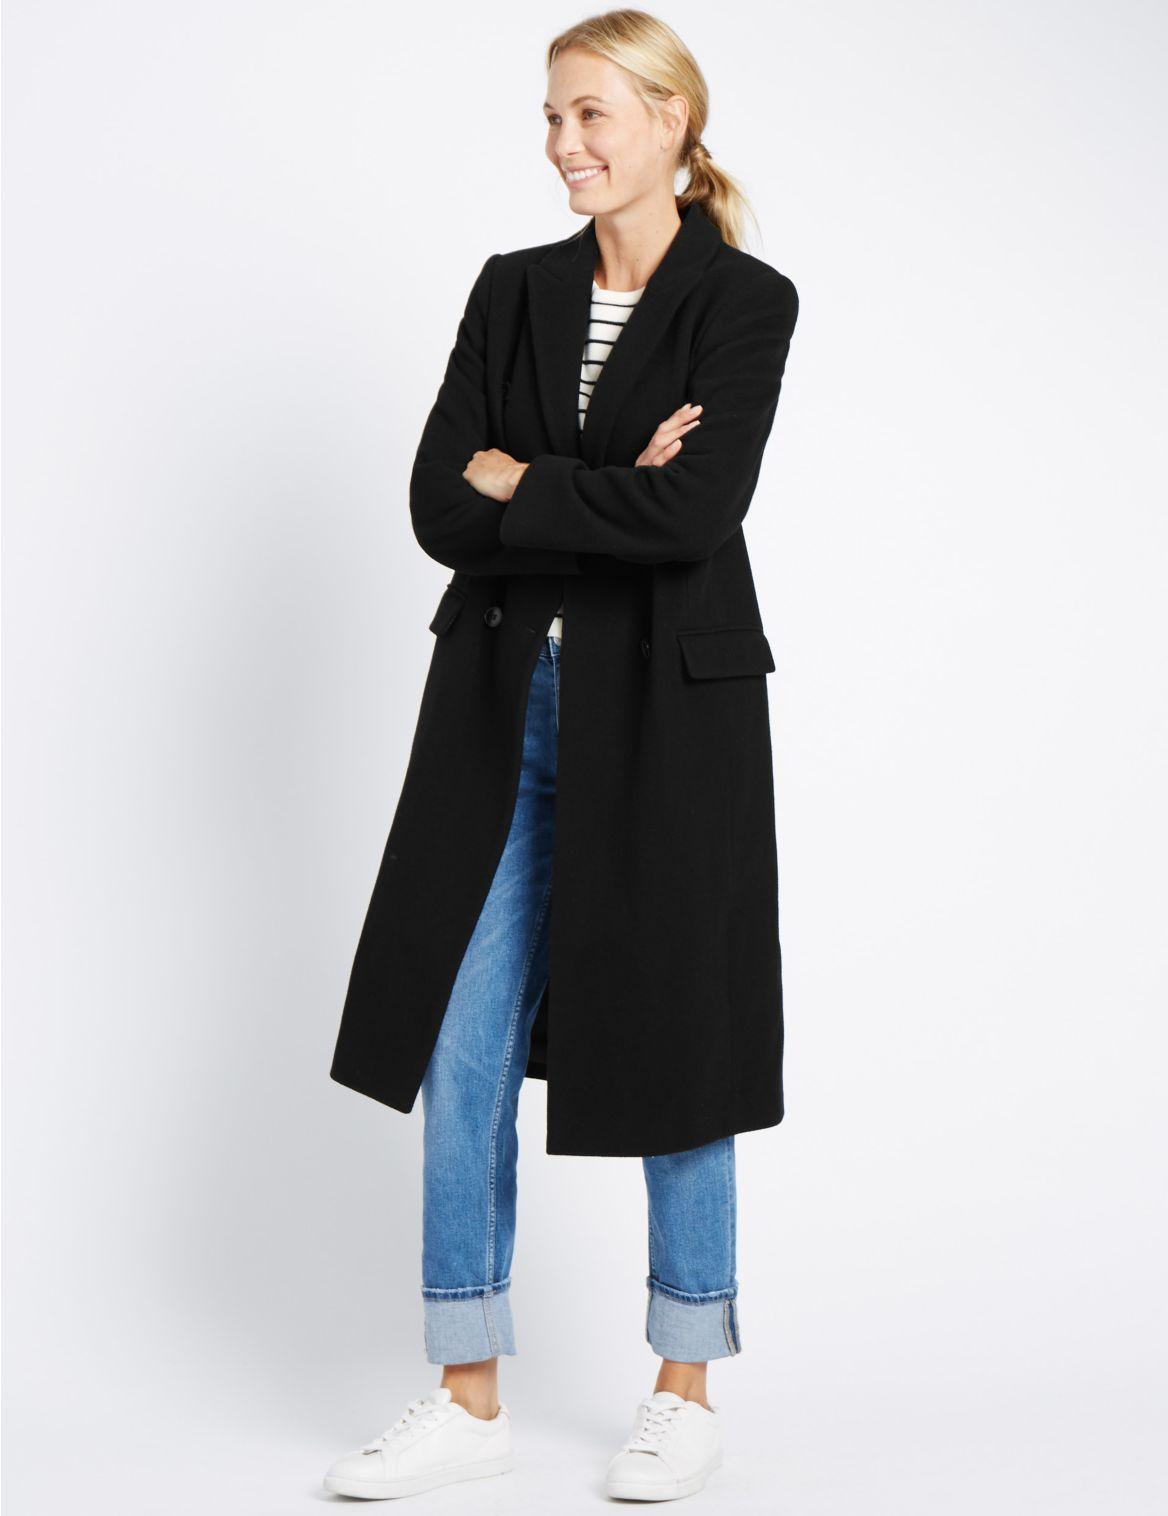 Lange jas met dubbele rij knopen